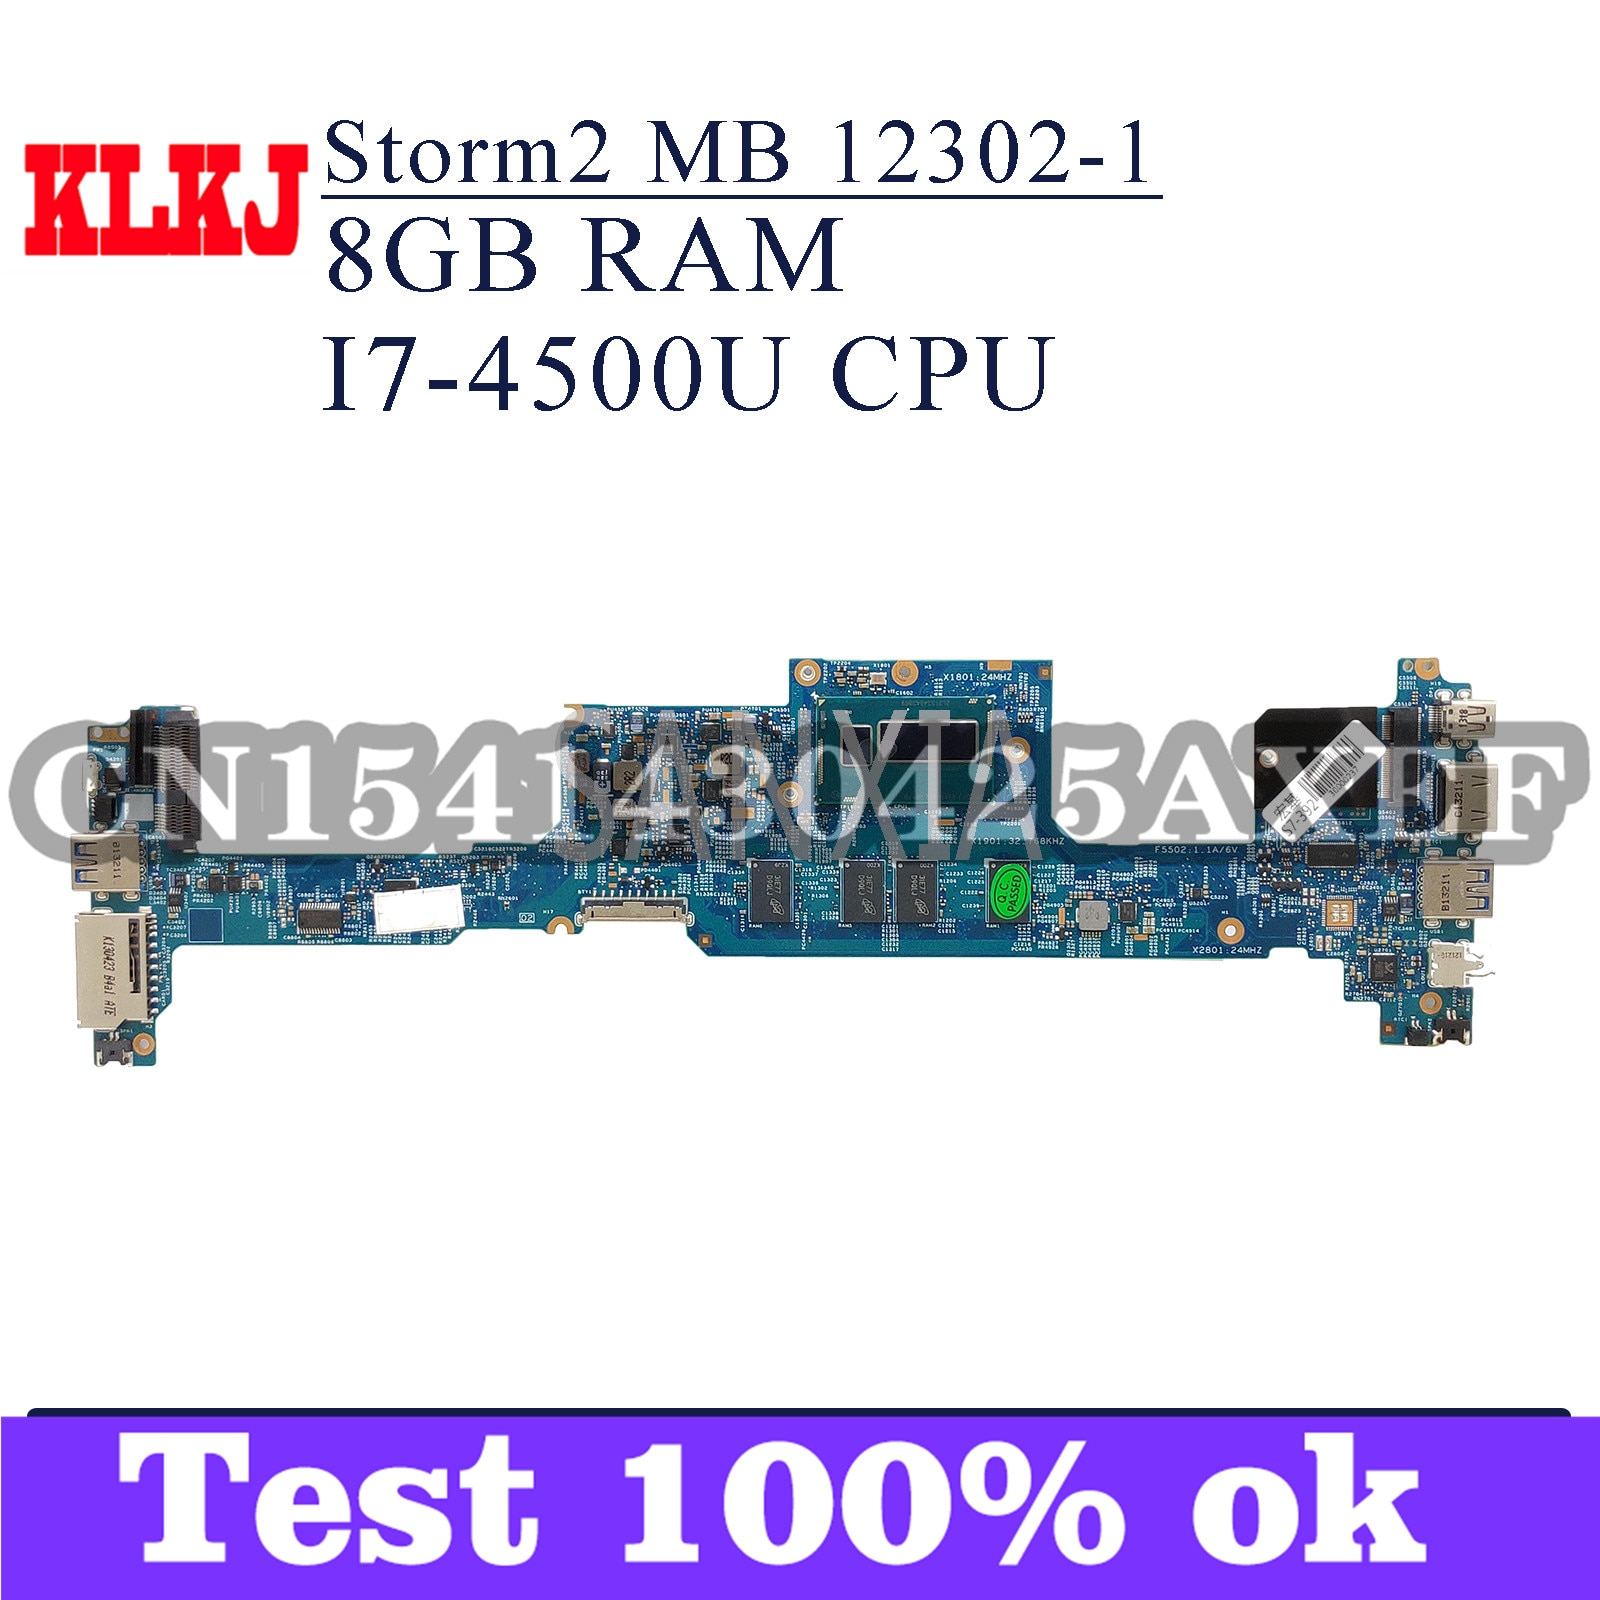 KLKJ 12302-1 اللوحة الأم للكمبيوتر المحمول لشركة أيسر S7-392 اللوحة الرئيسية الأصلية 8GB-RAM I7-4500U وحدة المعالجة المركزية